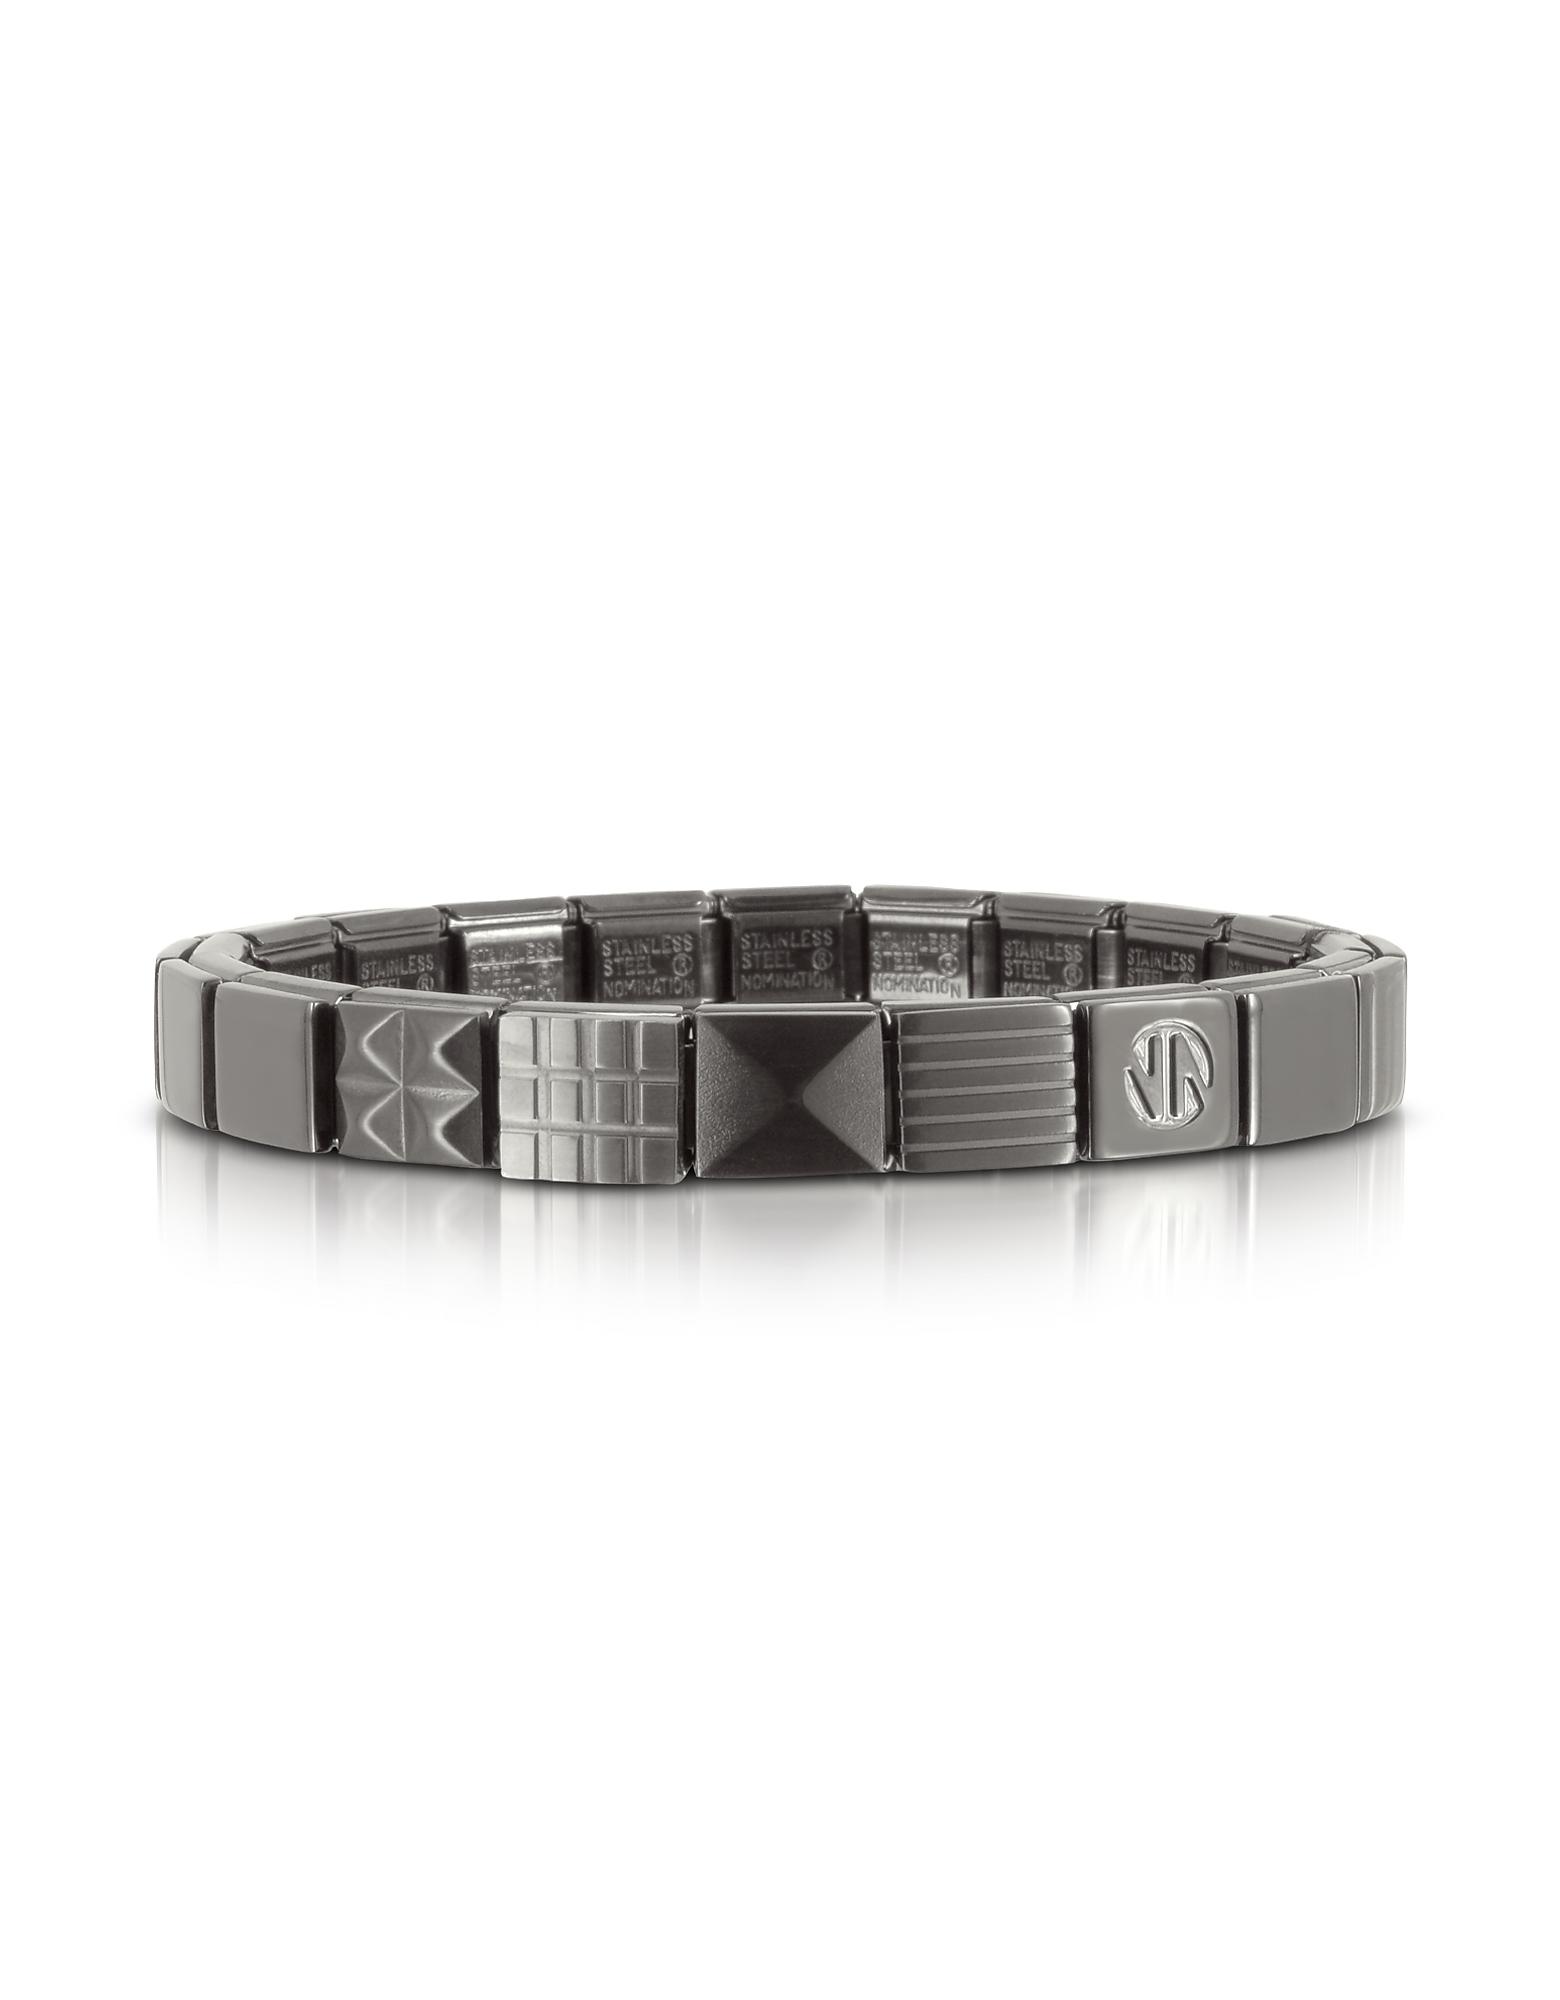 Nomination Men's Bracelets, Steel Ikons Geometric Brushed Stainless Steel Bracelet